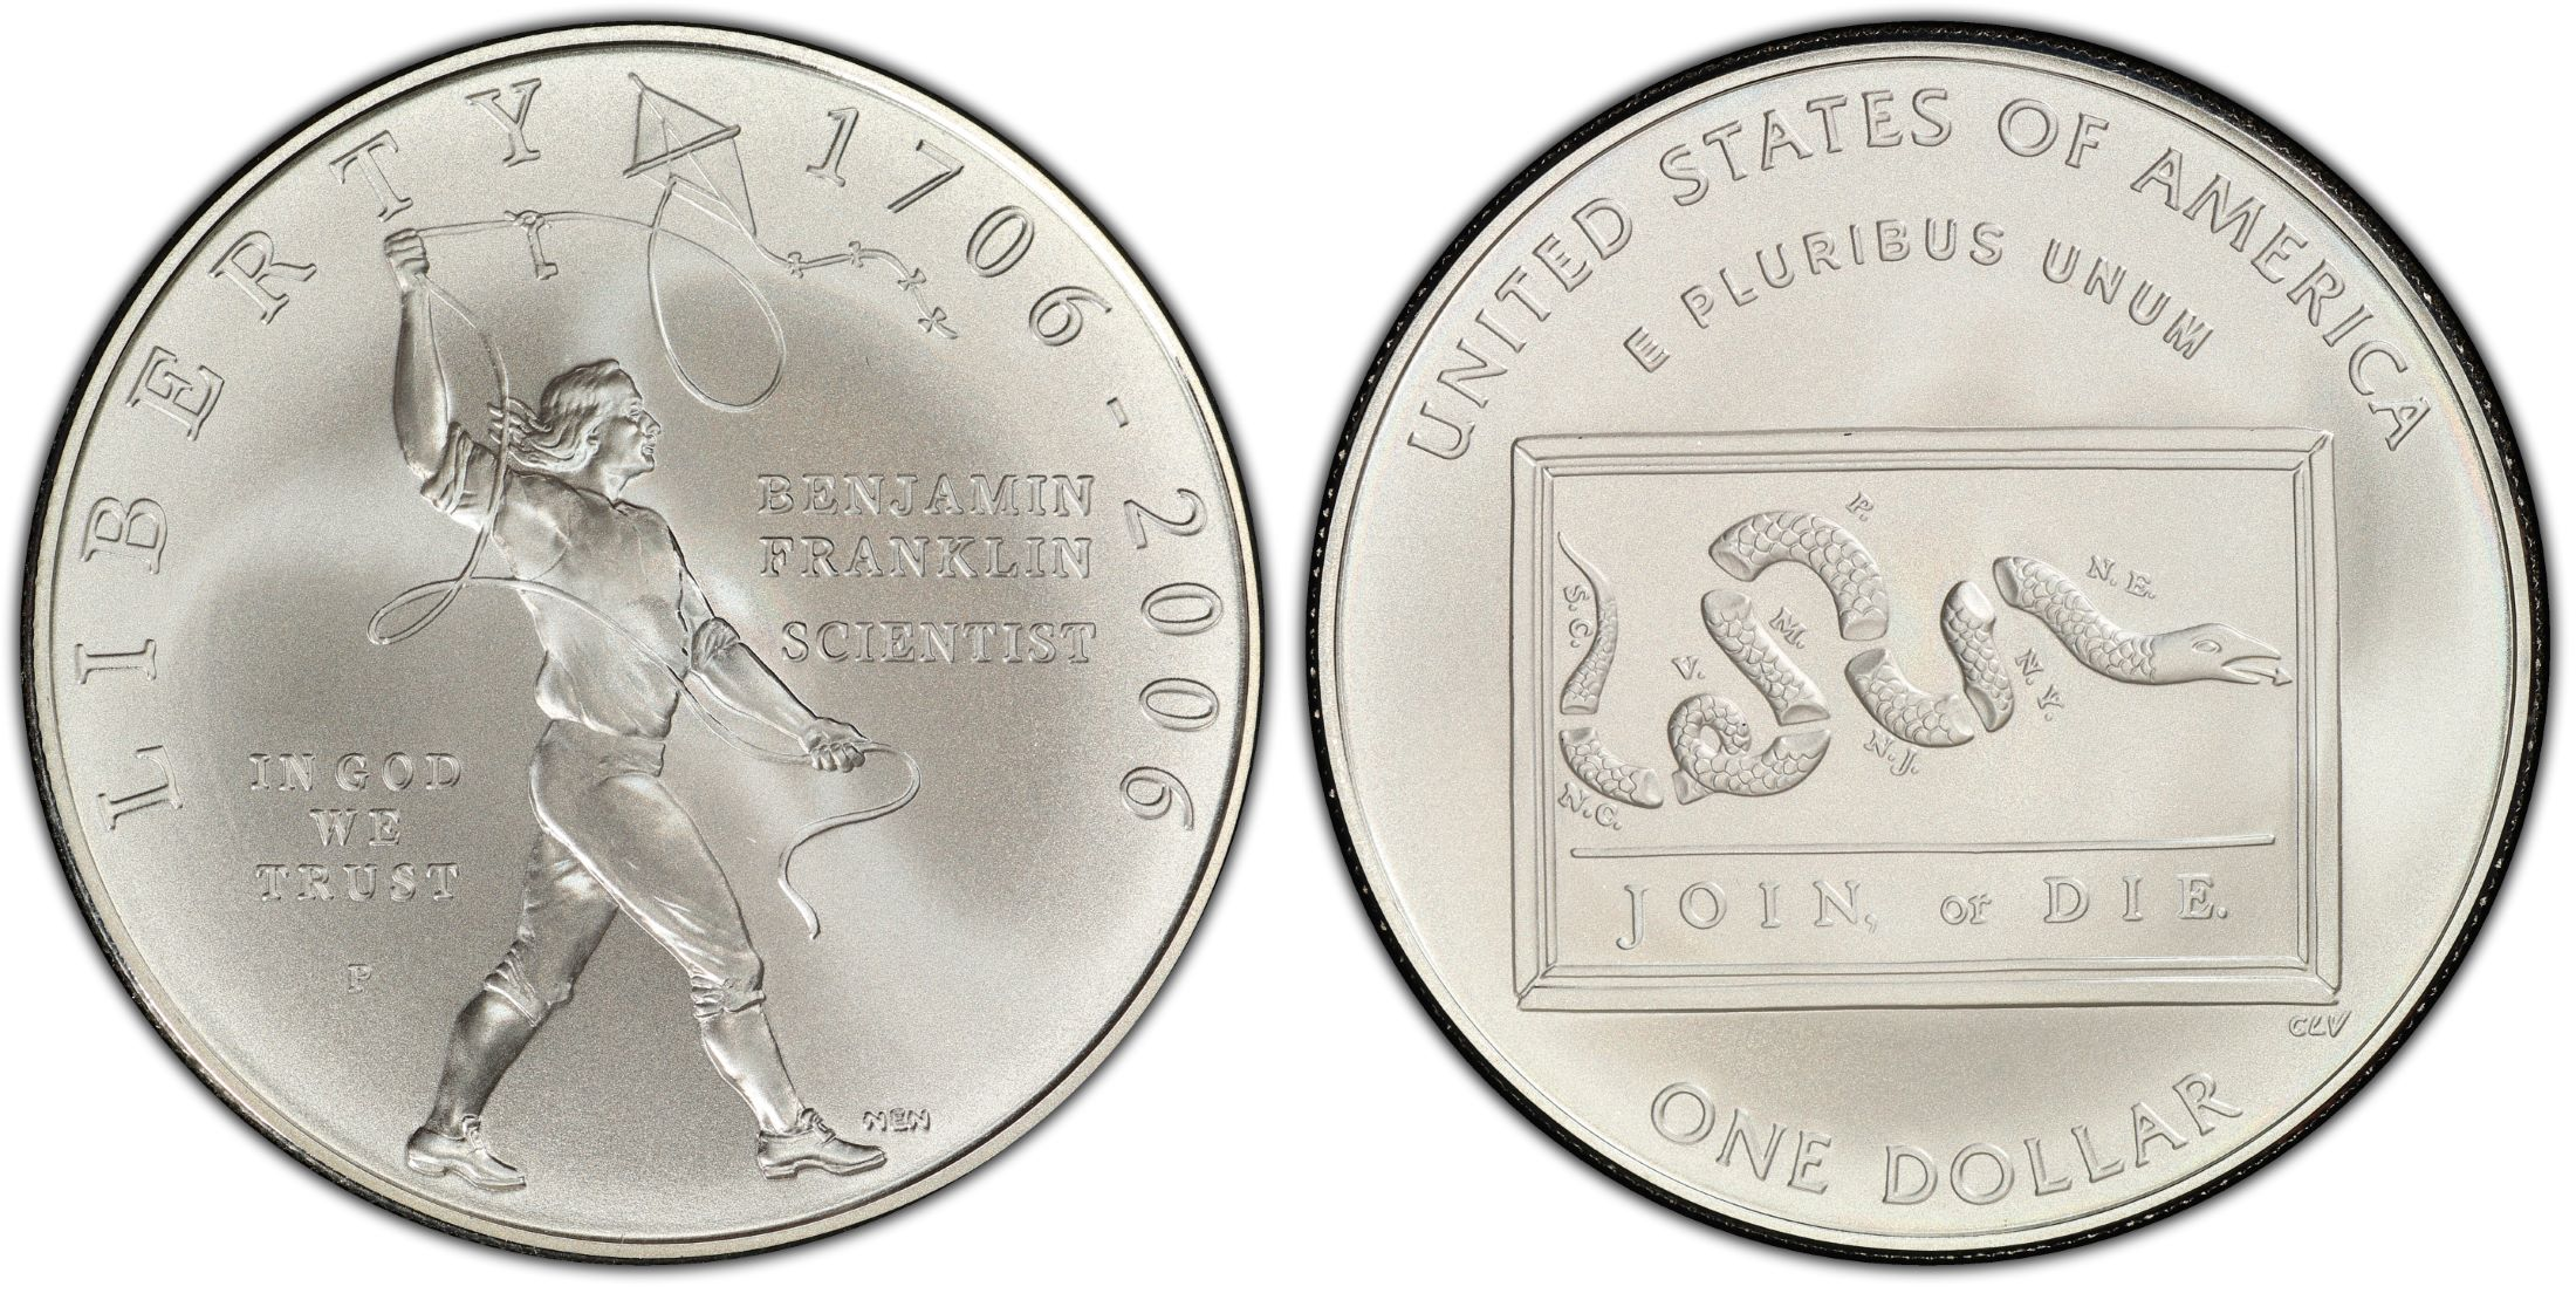 2006-P Franklin Founding Father Silver Commemorative Dollar PR69DCAM PCGS Proof